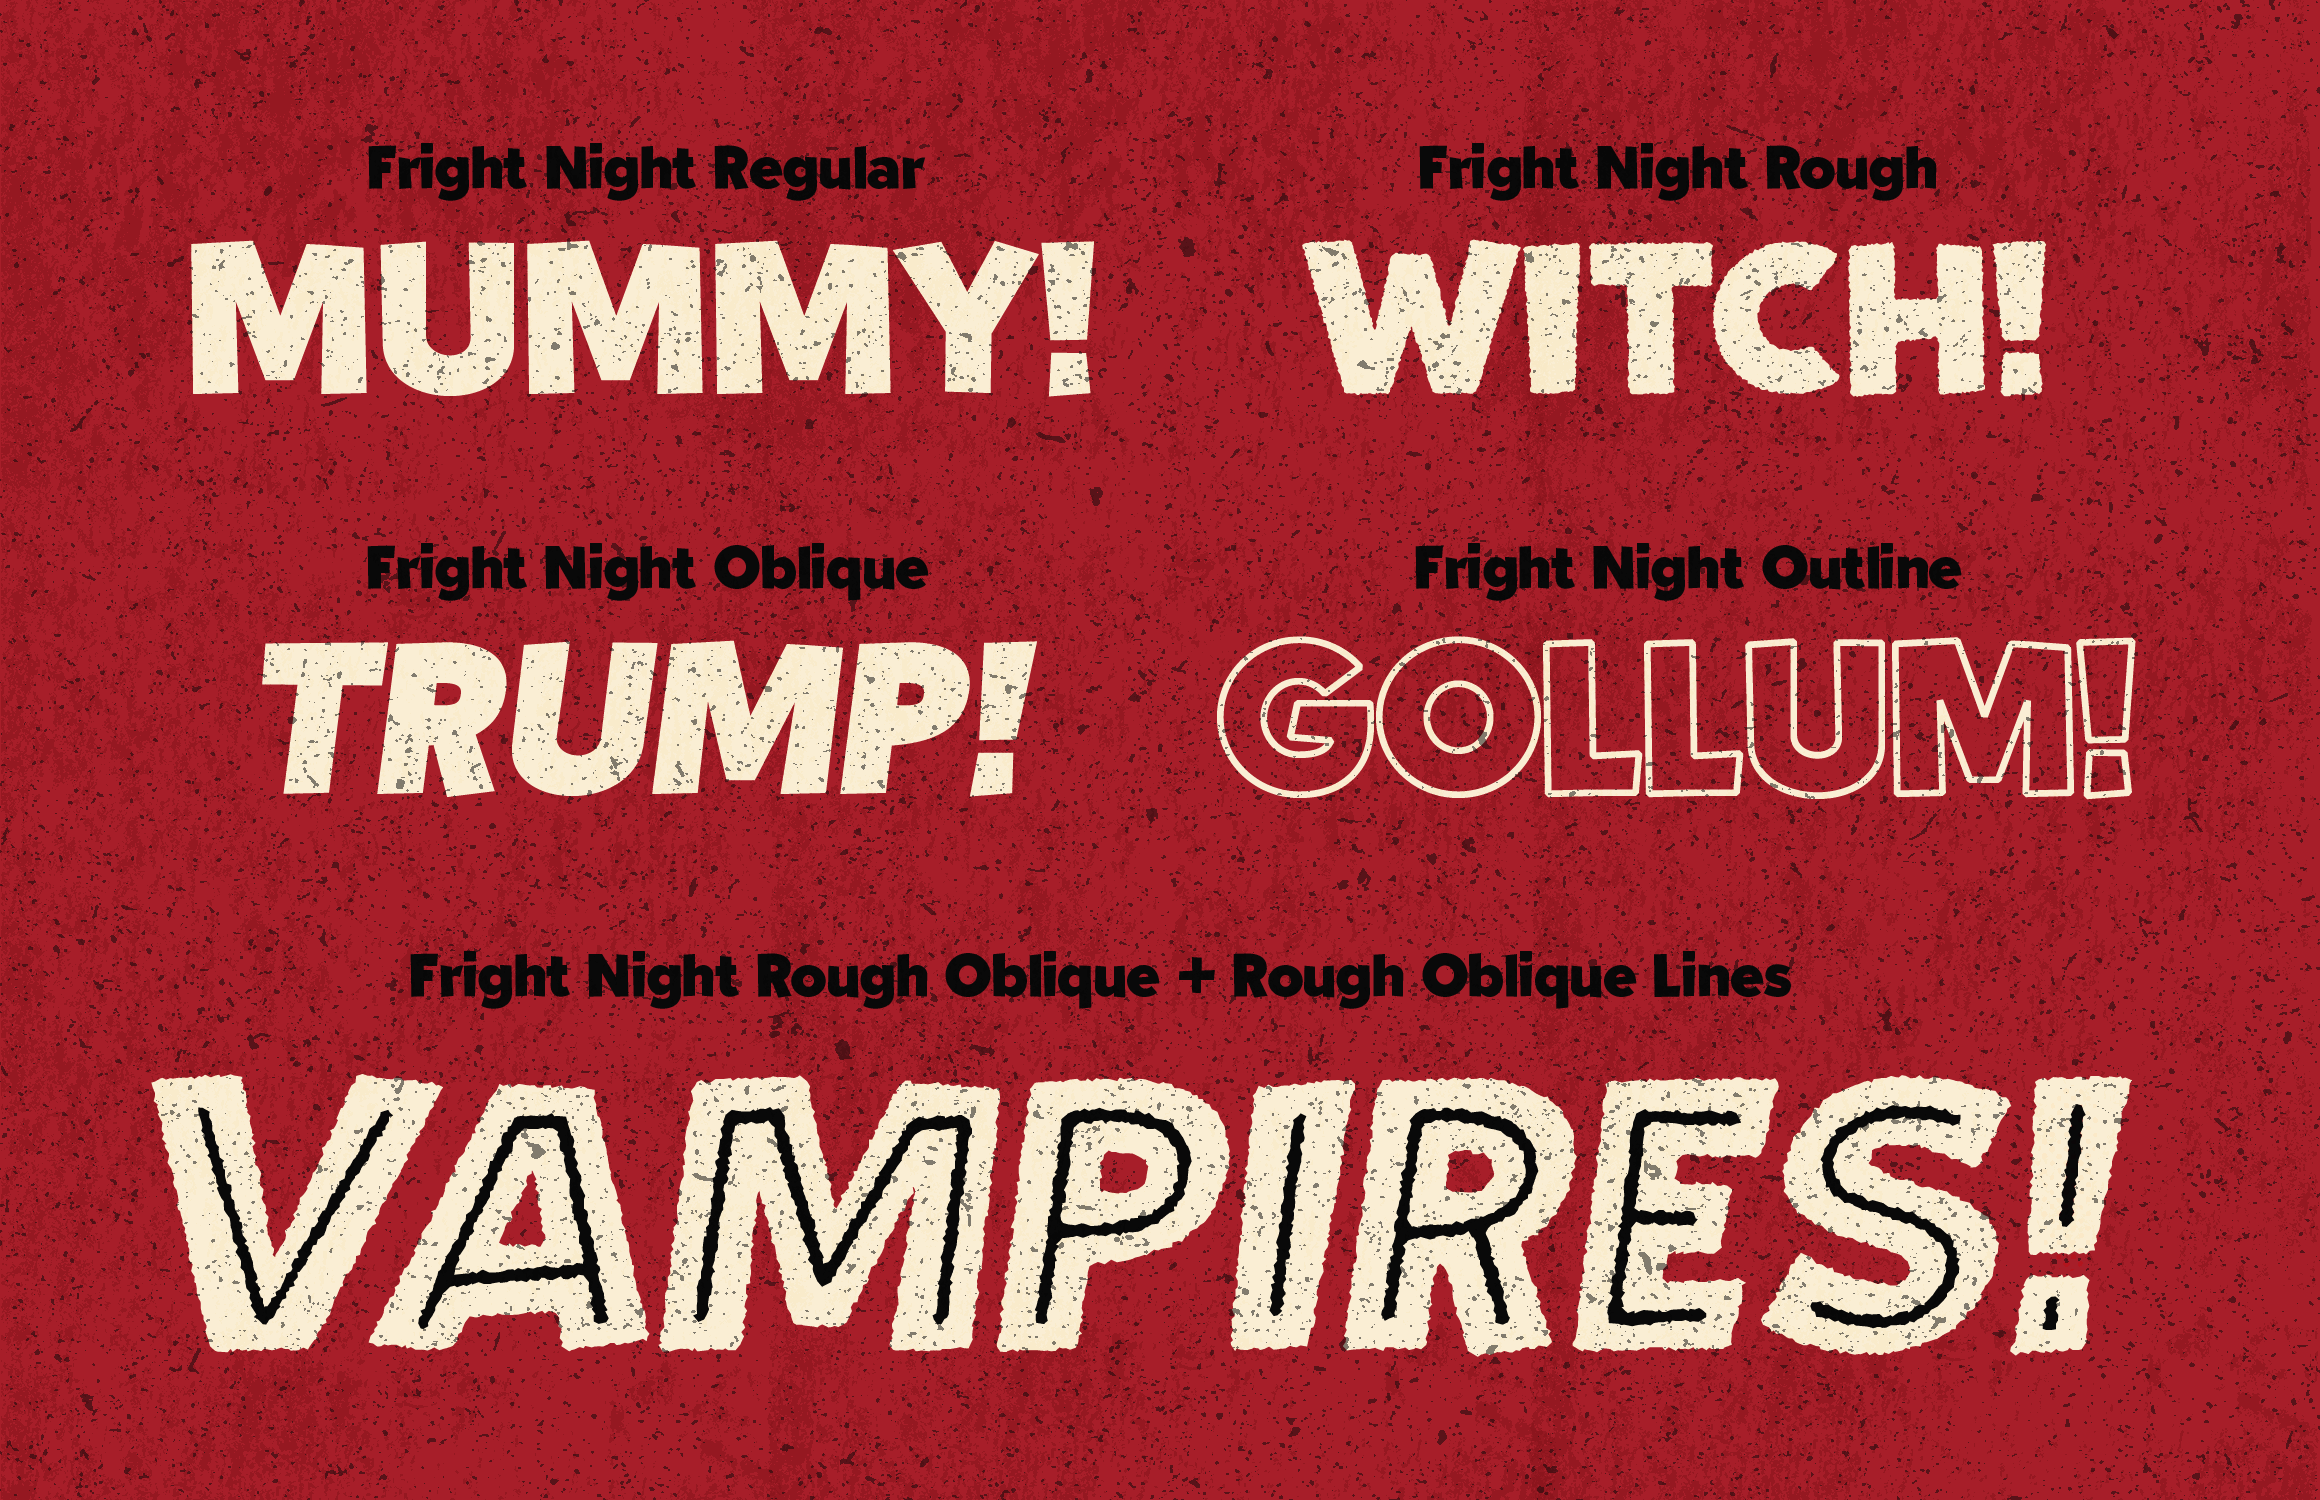 Fright Night! example image 2